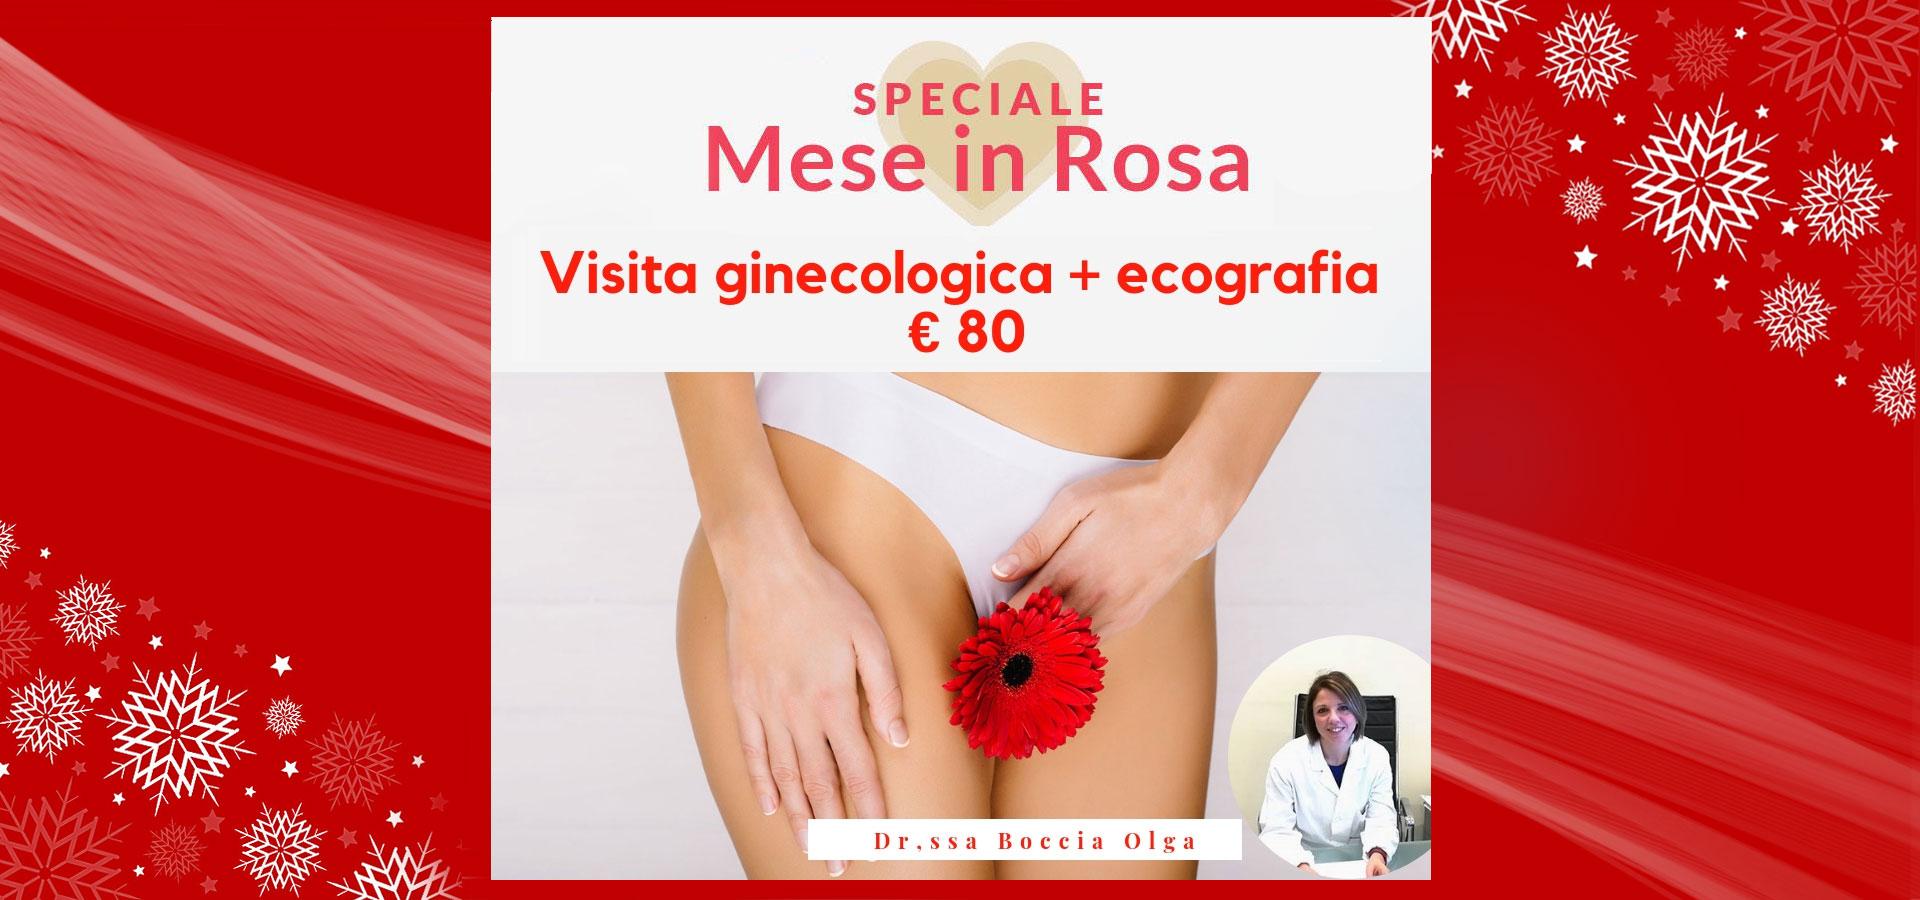 Speciale Mese in Rosa Centro Athena